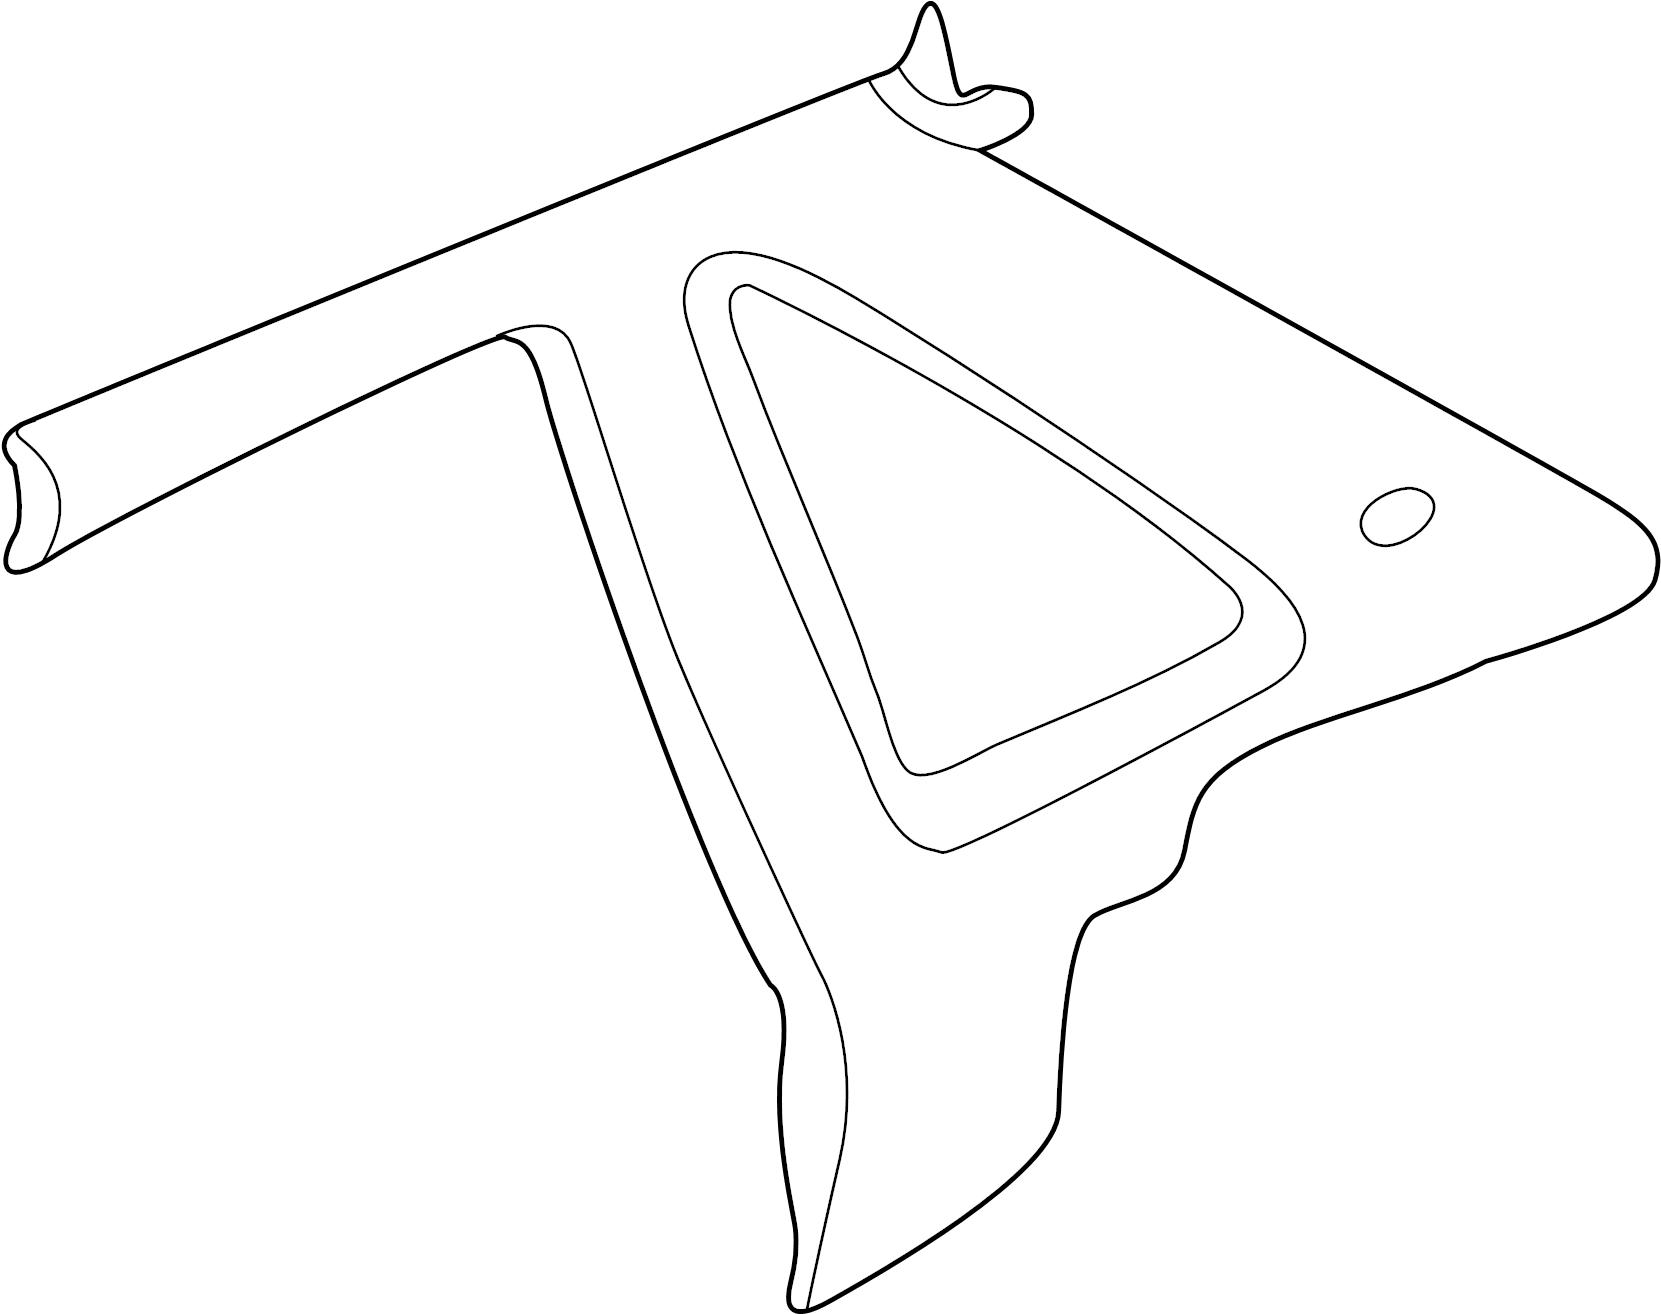 Jaguar XJ8 Interior Quarter Panel Trim Panel (Rear, Lower